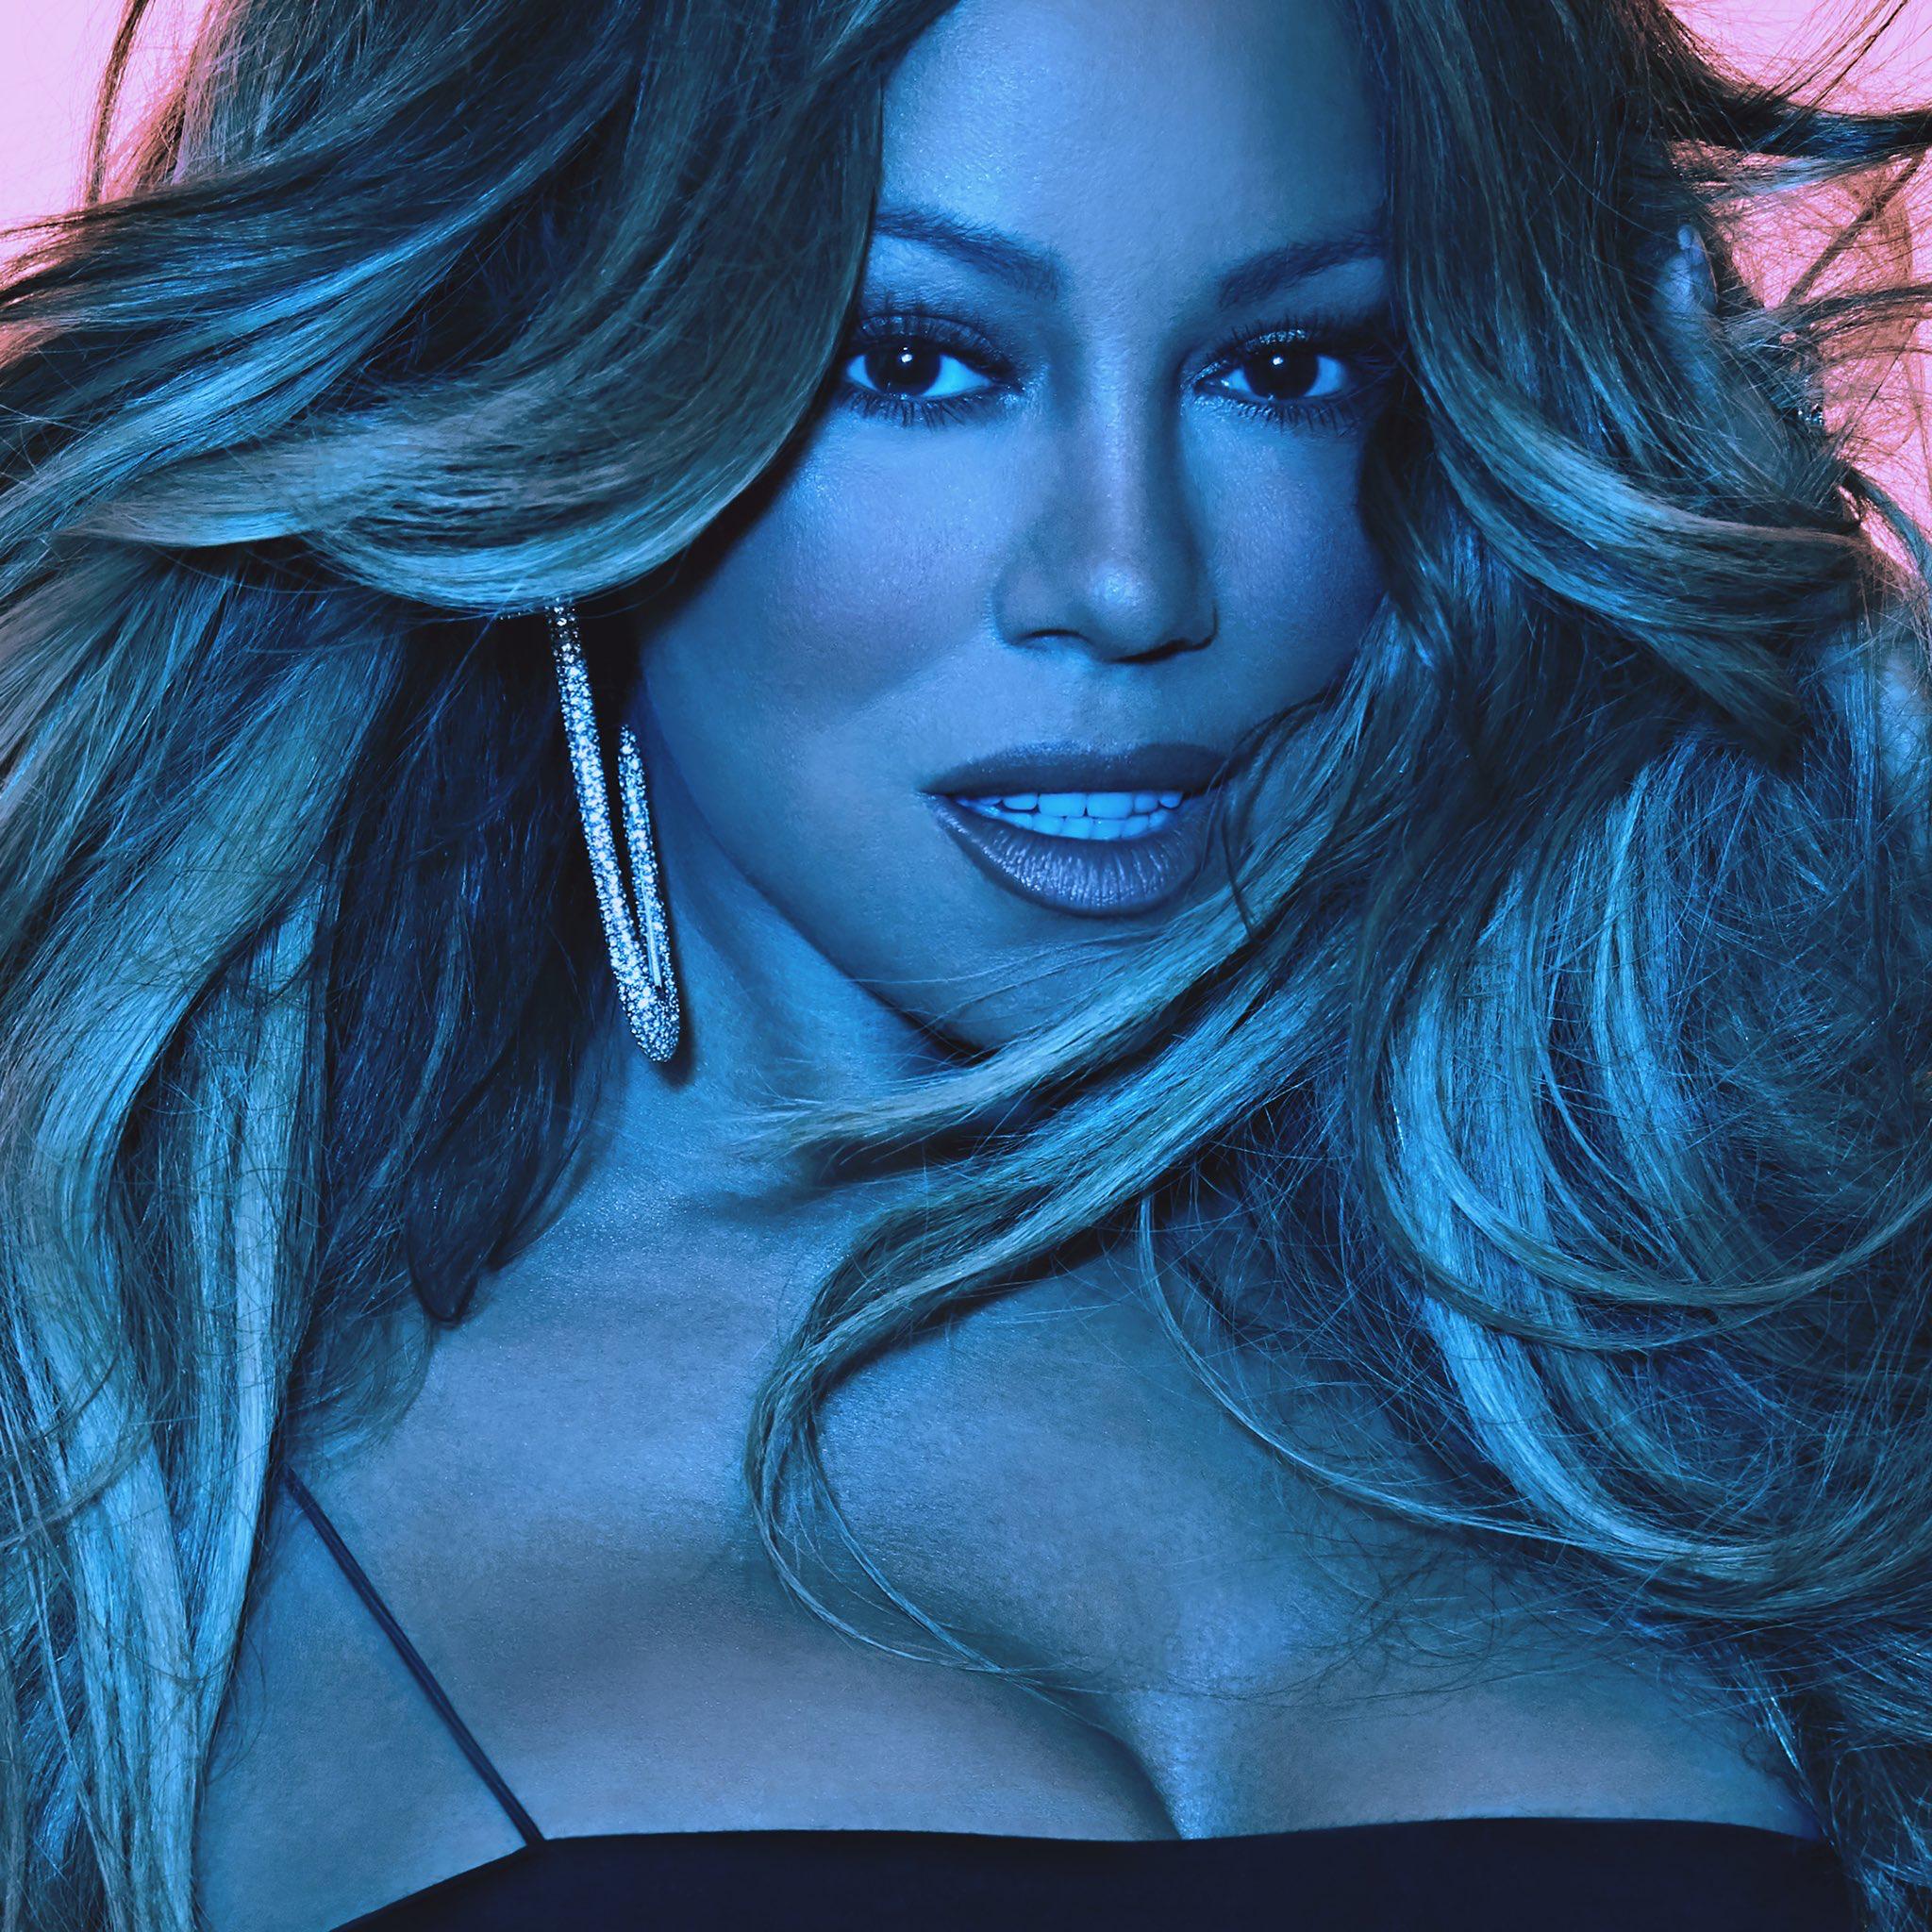 I love a good chant!S-P-I-R-I-T! - - Mariah Carey